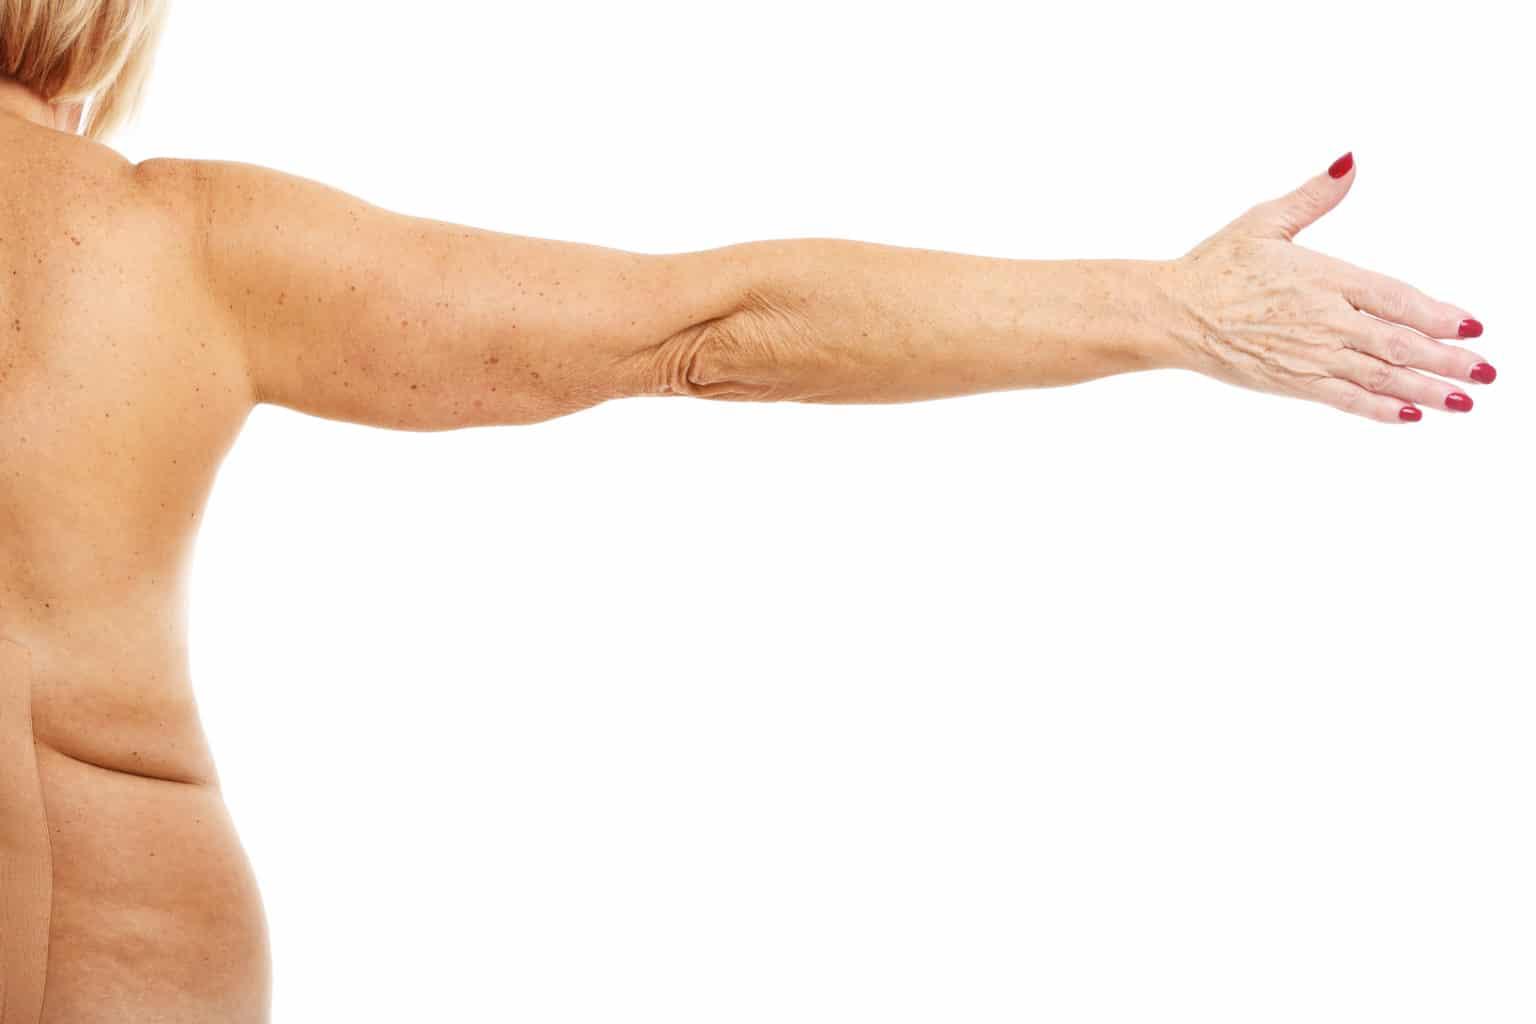 Armplastik hos Plastikkirurgen Stockholm